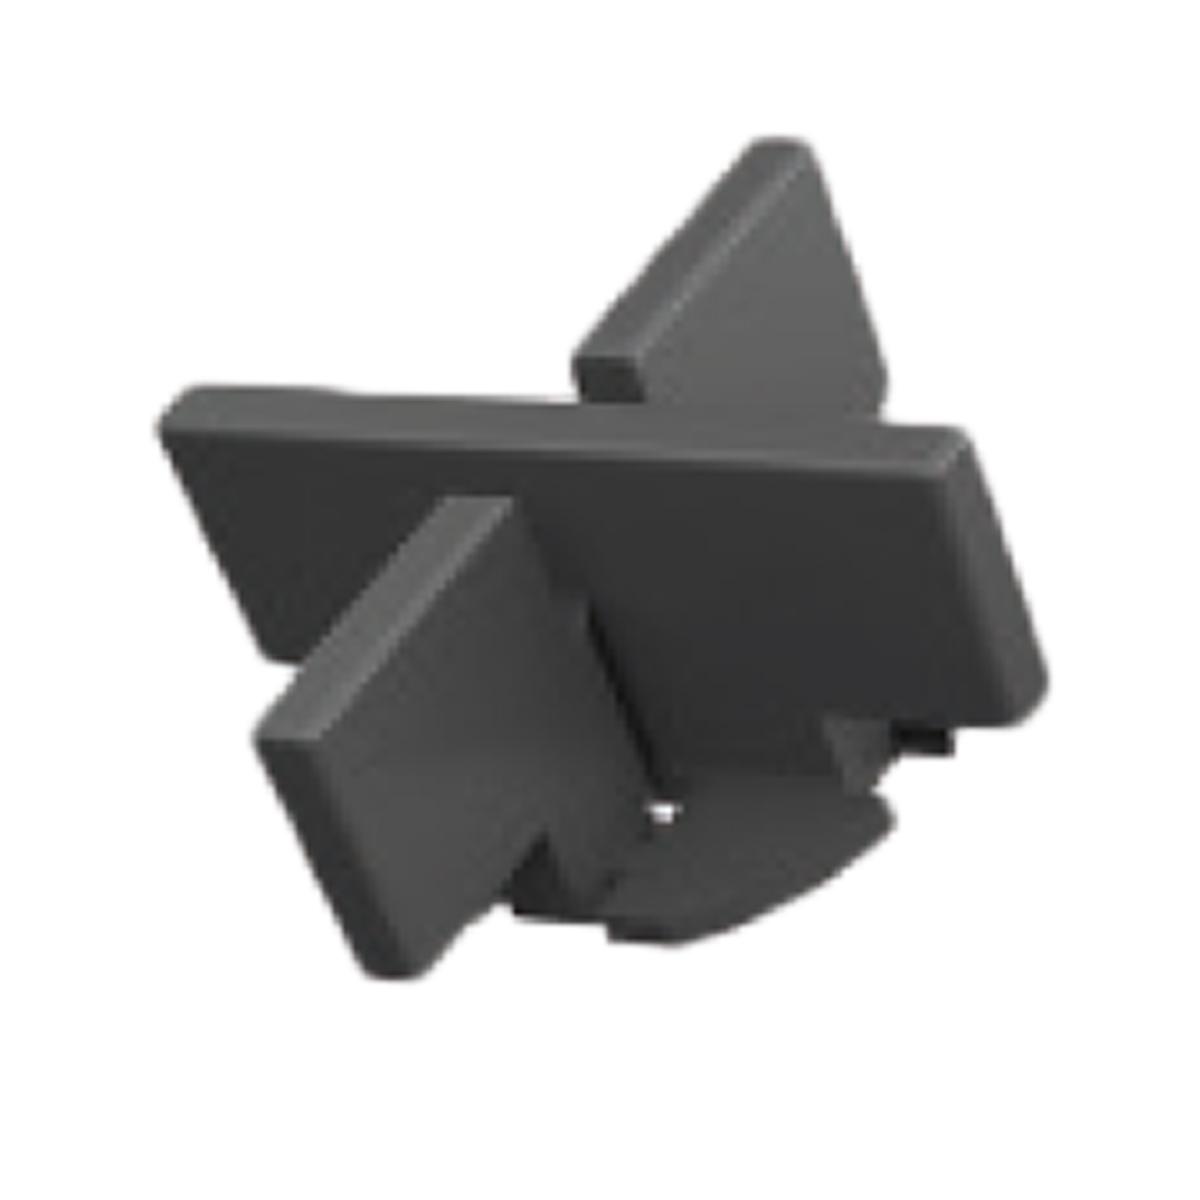 Accessori Accessori Uptec SUPD Profilitec